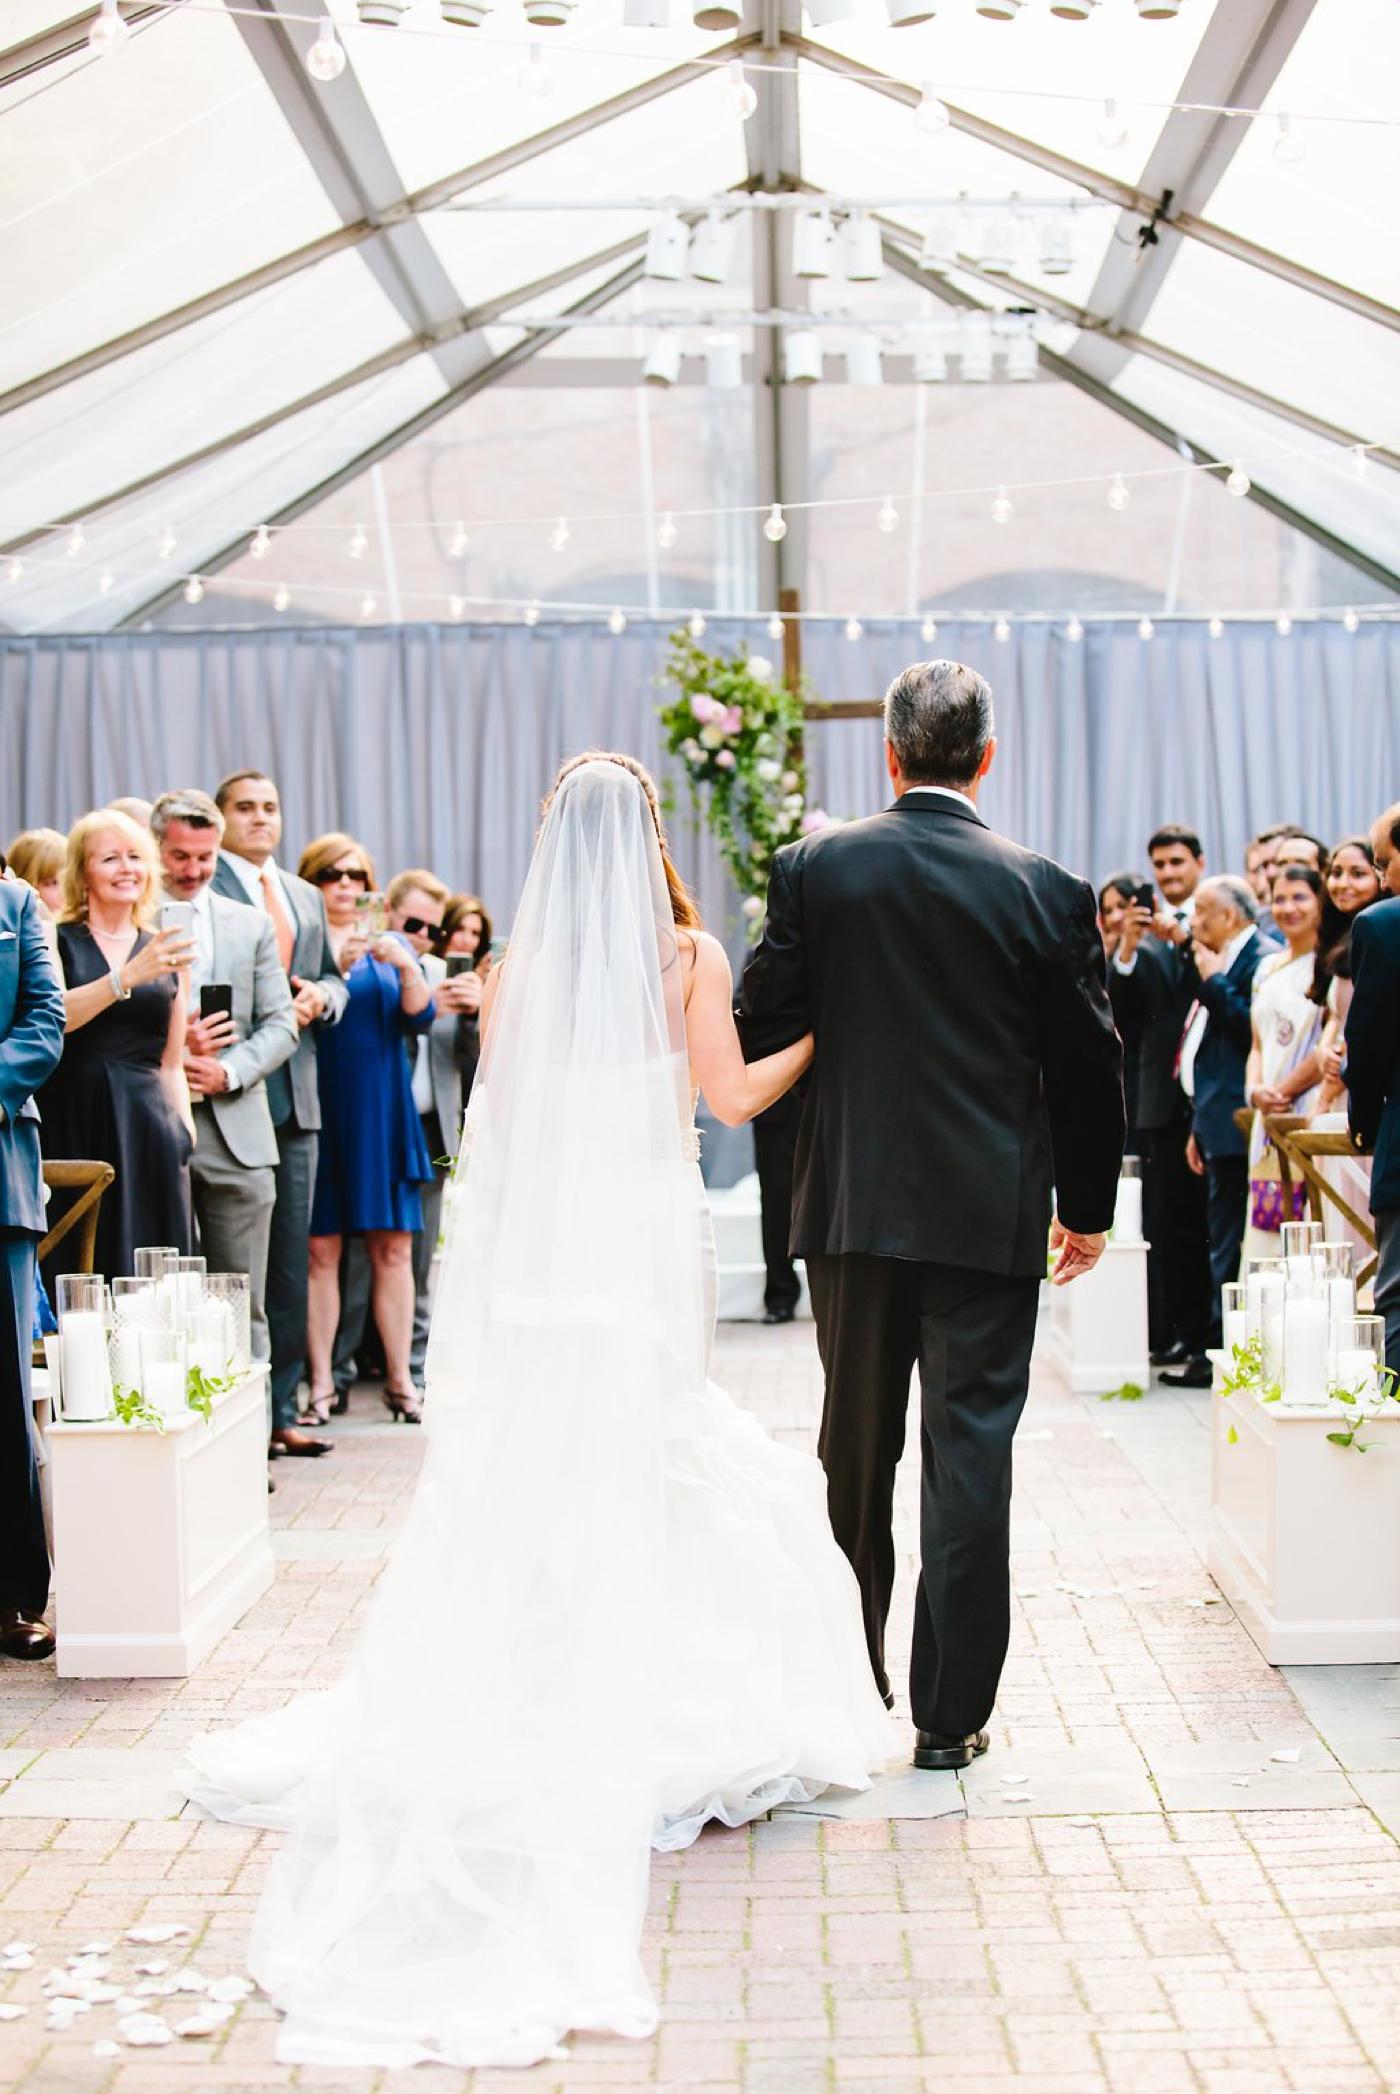 chicago-fine-art-wedding-photography-sakamuri52